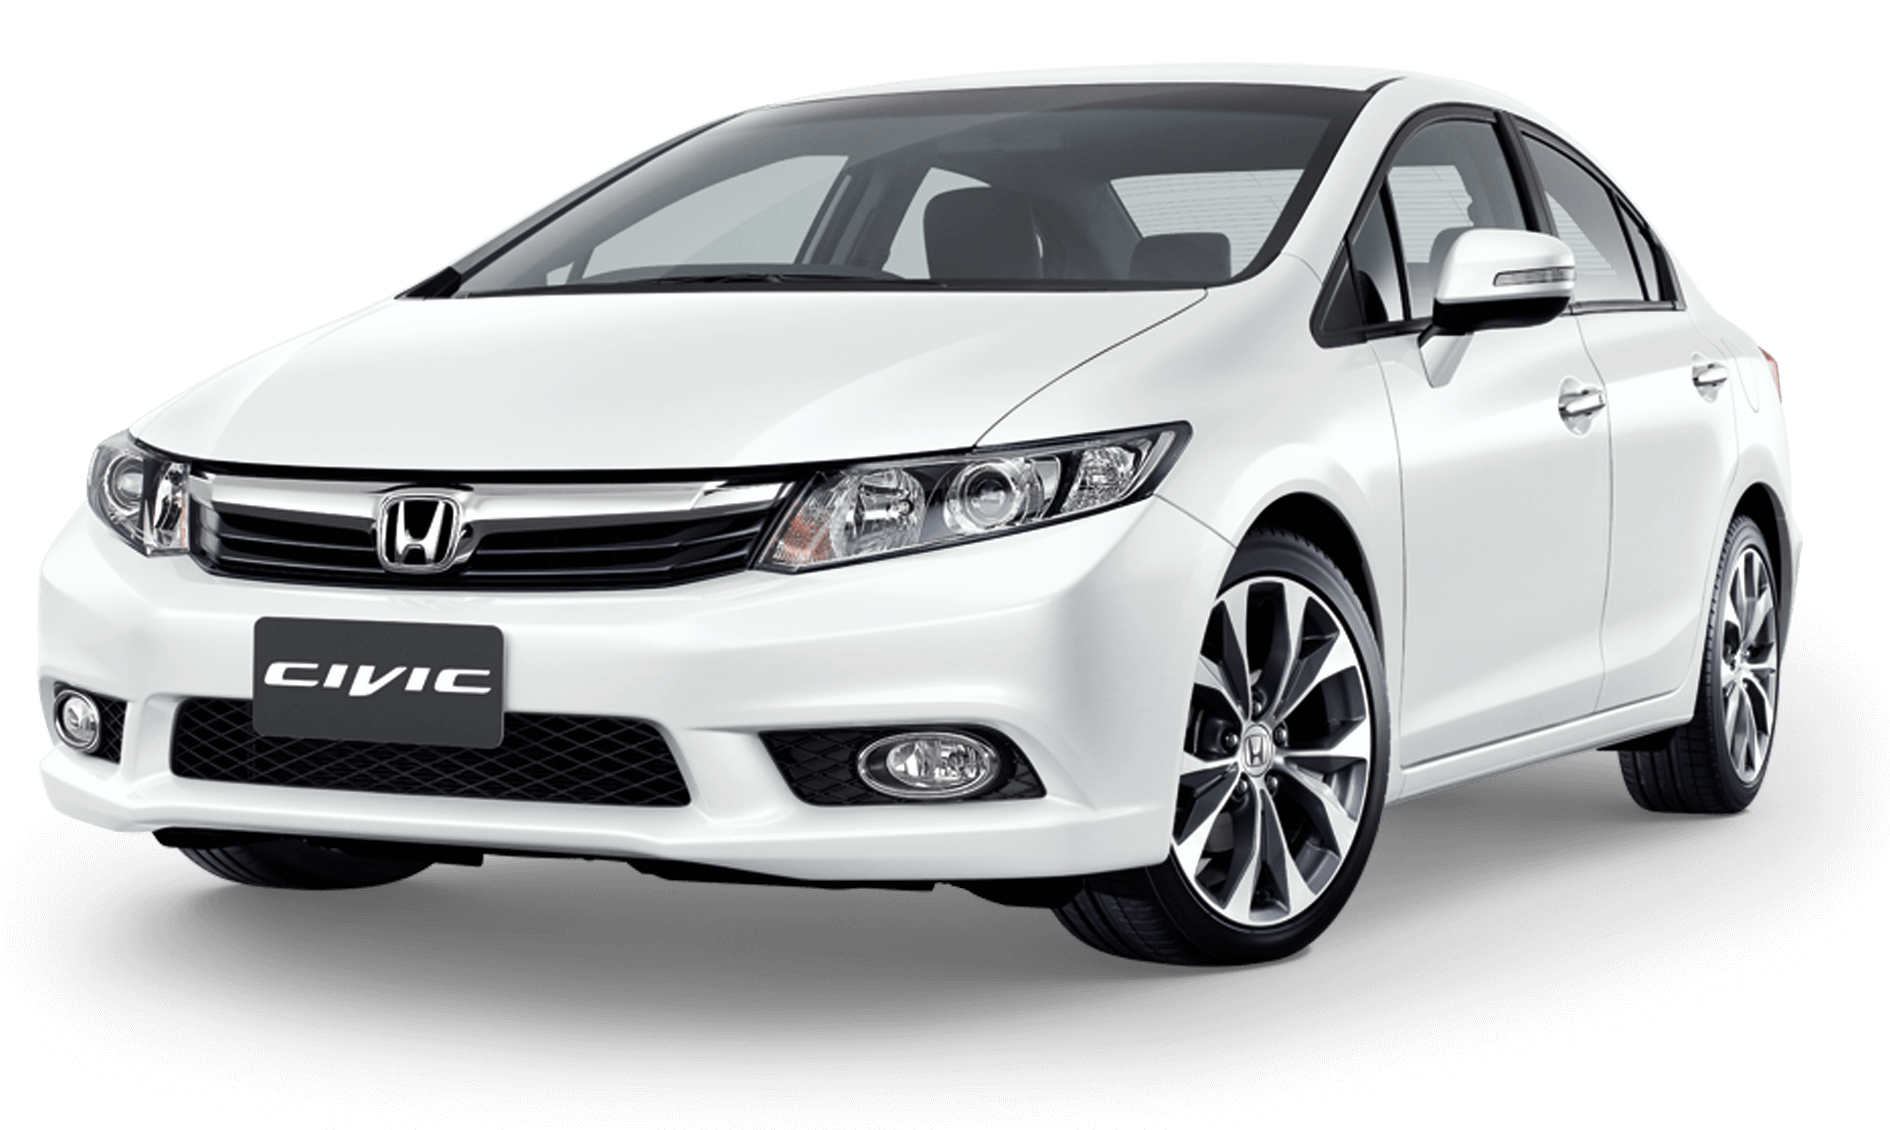 Honda civic 1 8v at is very good car honda civic 1 8v at for 2017 honda civic reliability